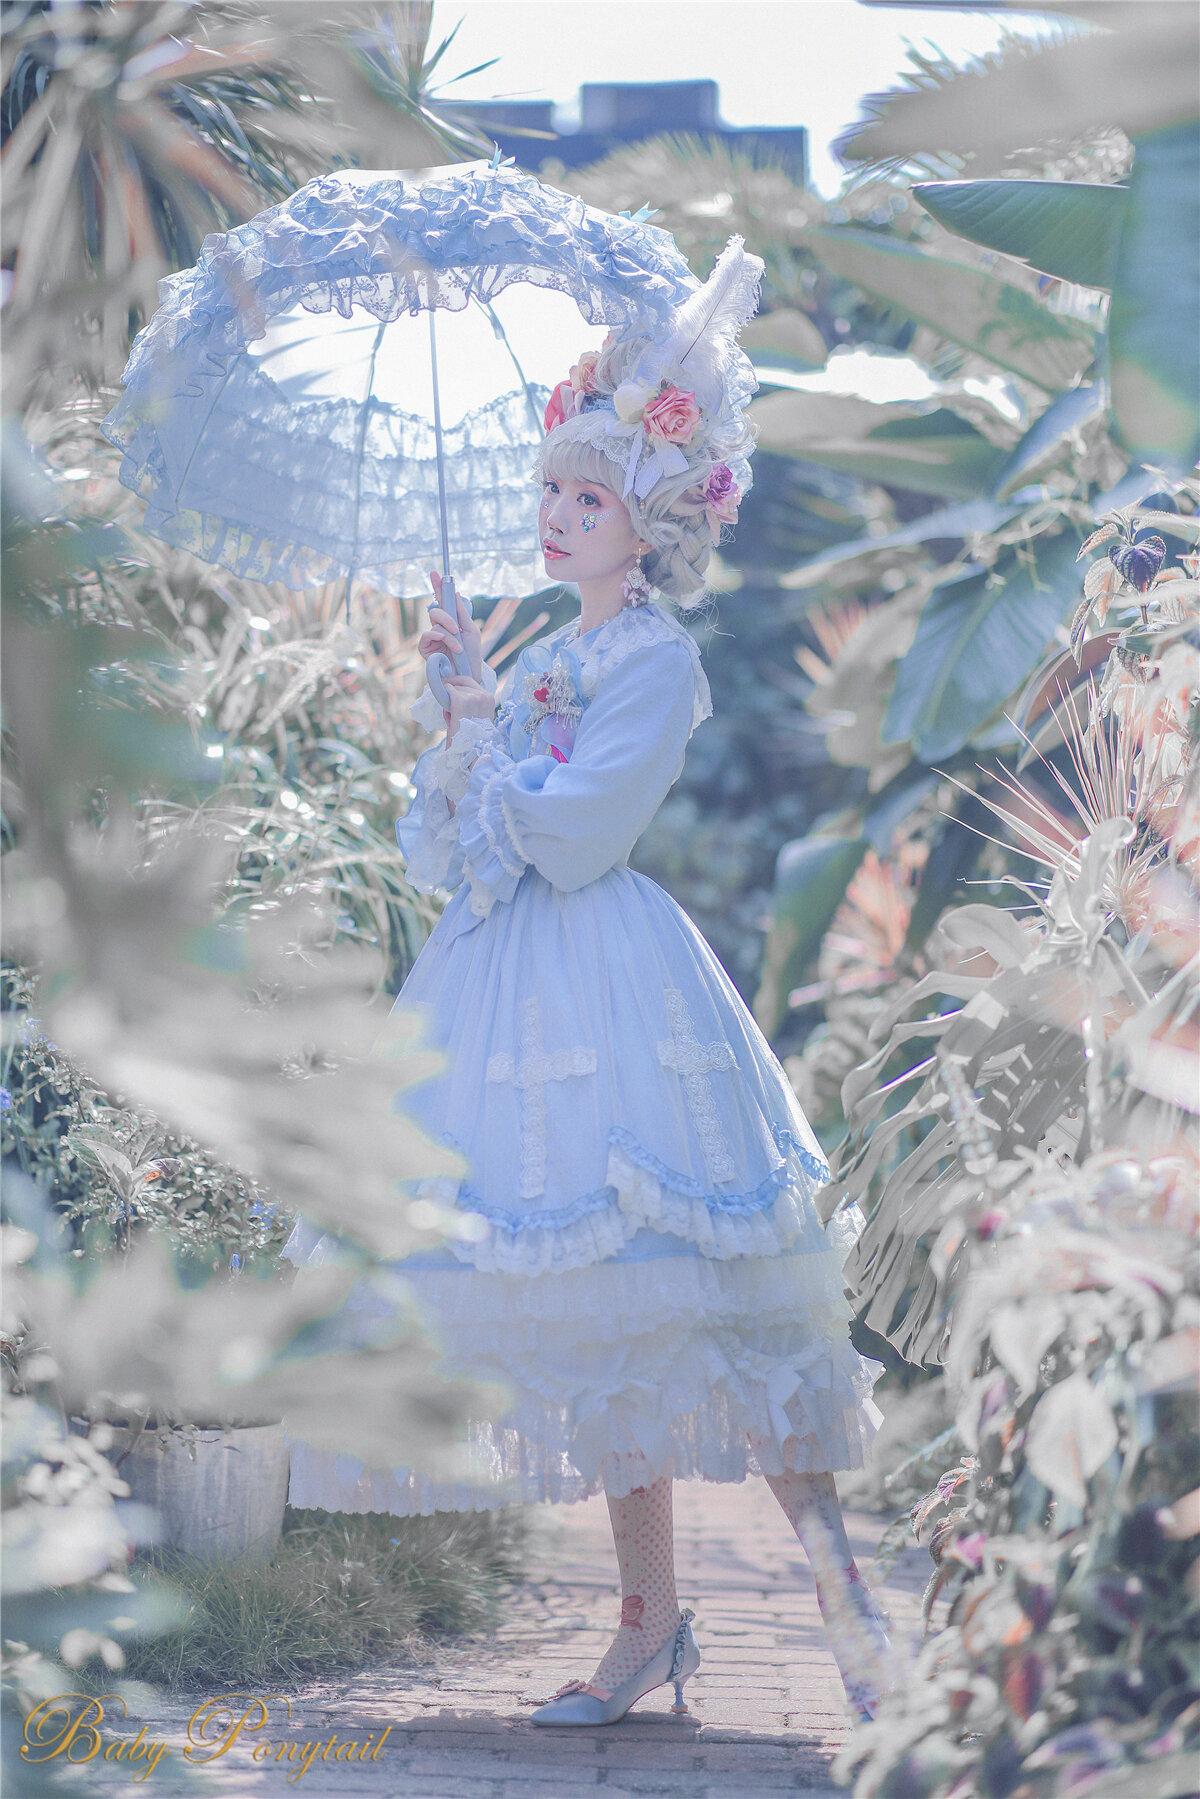 Babyponytail_Heavenly Teardrops_Model photo_JSK SAX_KAKA_04.jpg